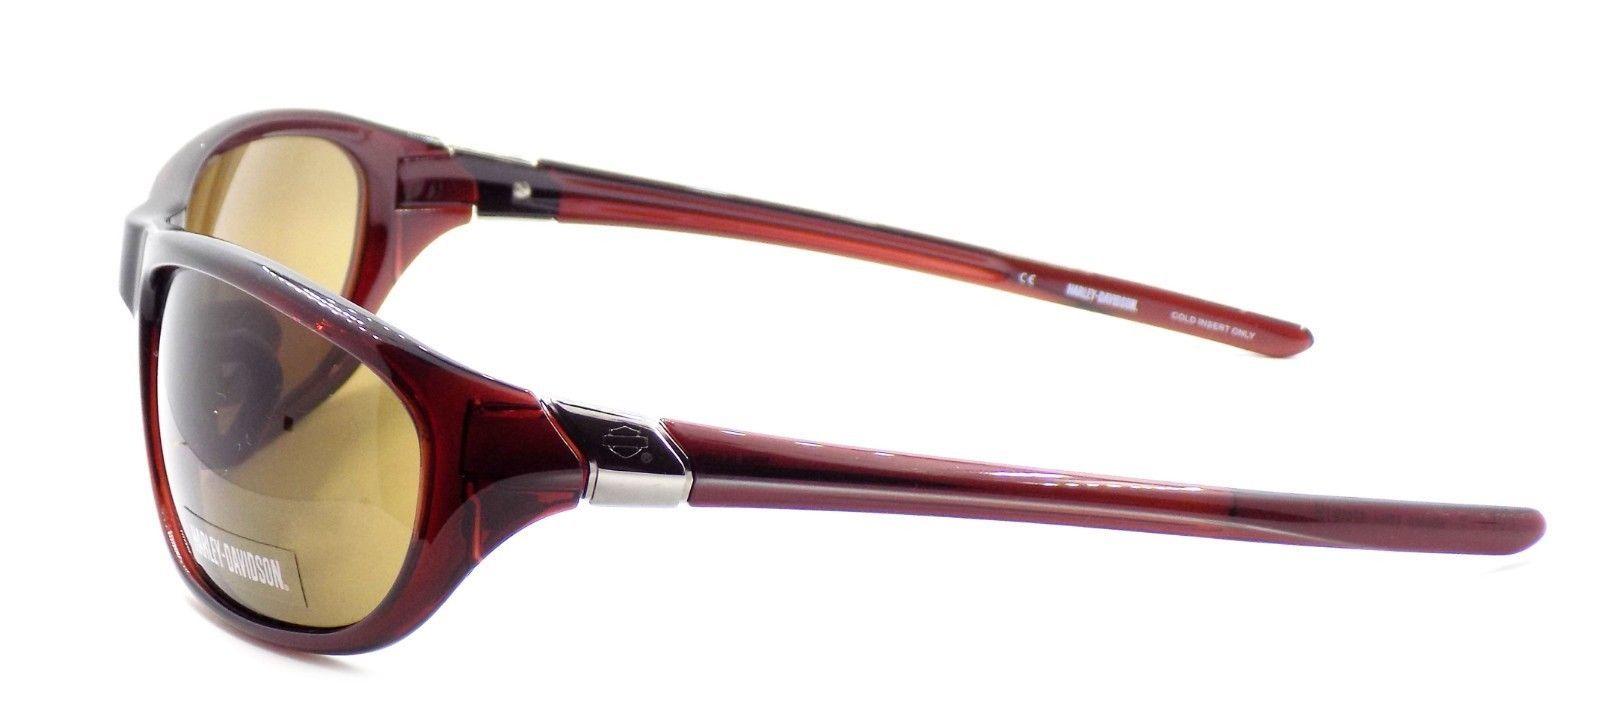 Harley Davidson HDX862 BRN-1 Wraparound Sunglasses Brown 67-19-135 Brown Lens